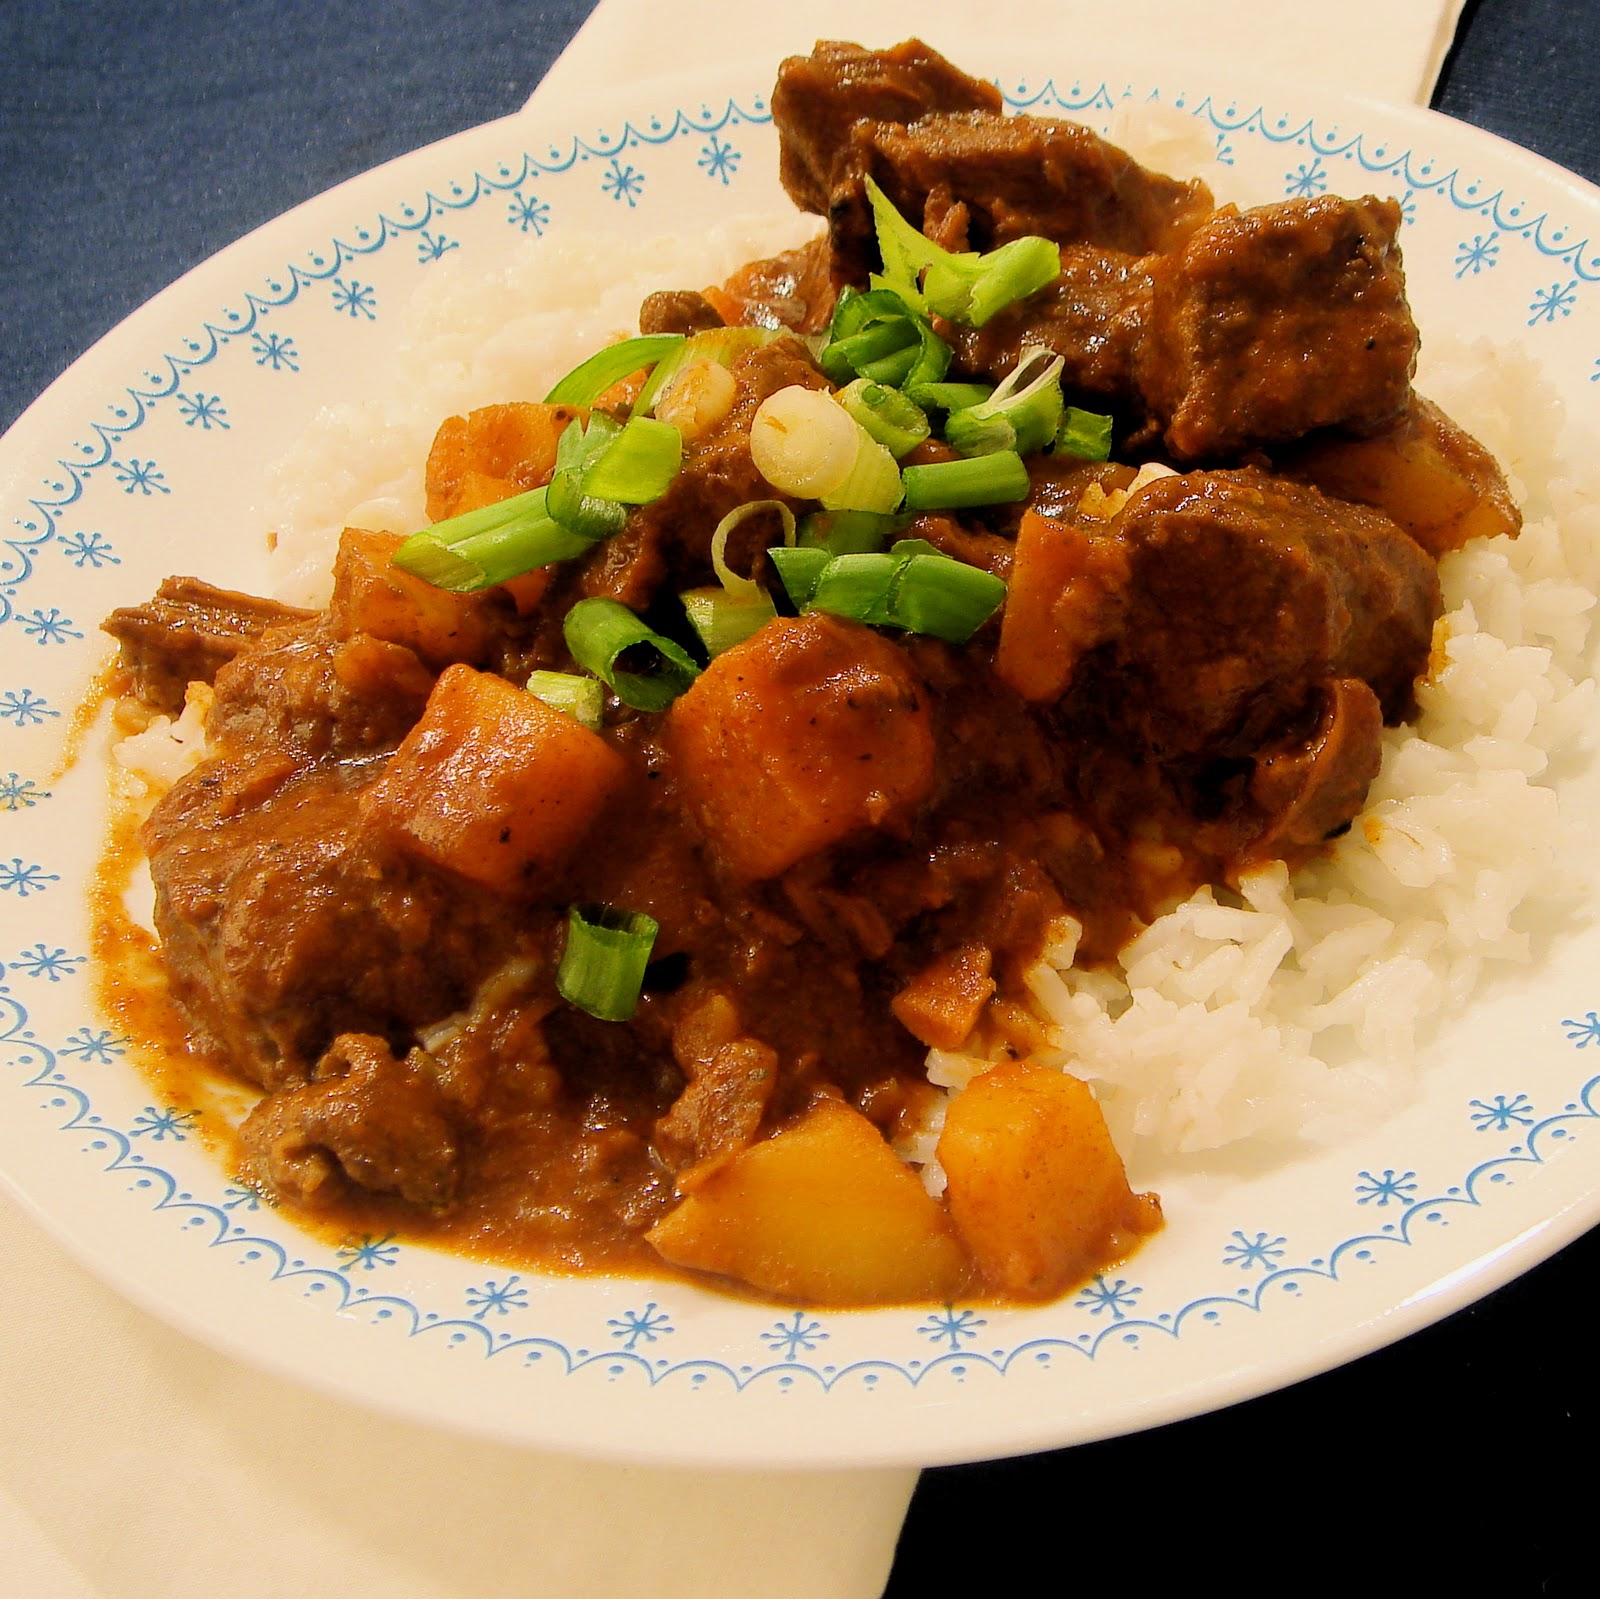 greenhorn gourmande: Beef Roast Transformed-Rendang Curry